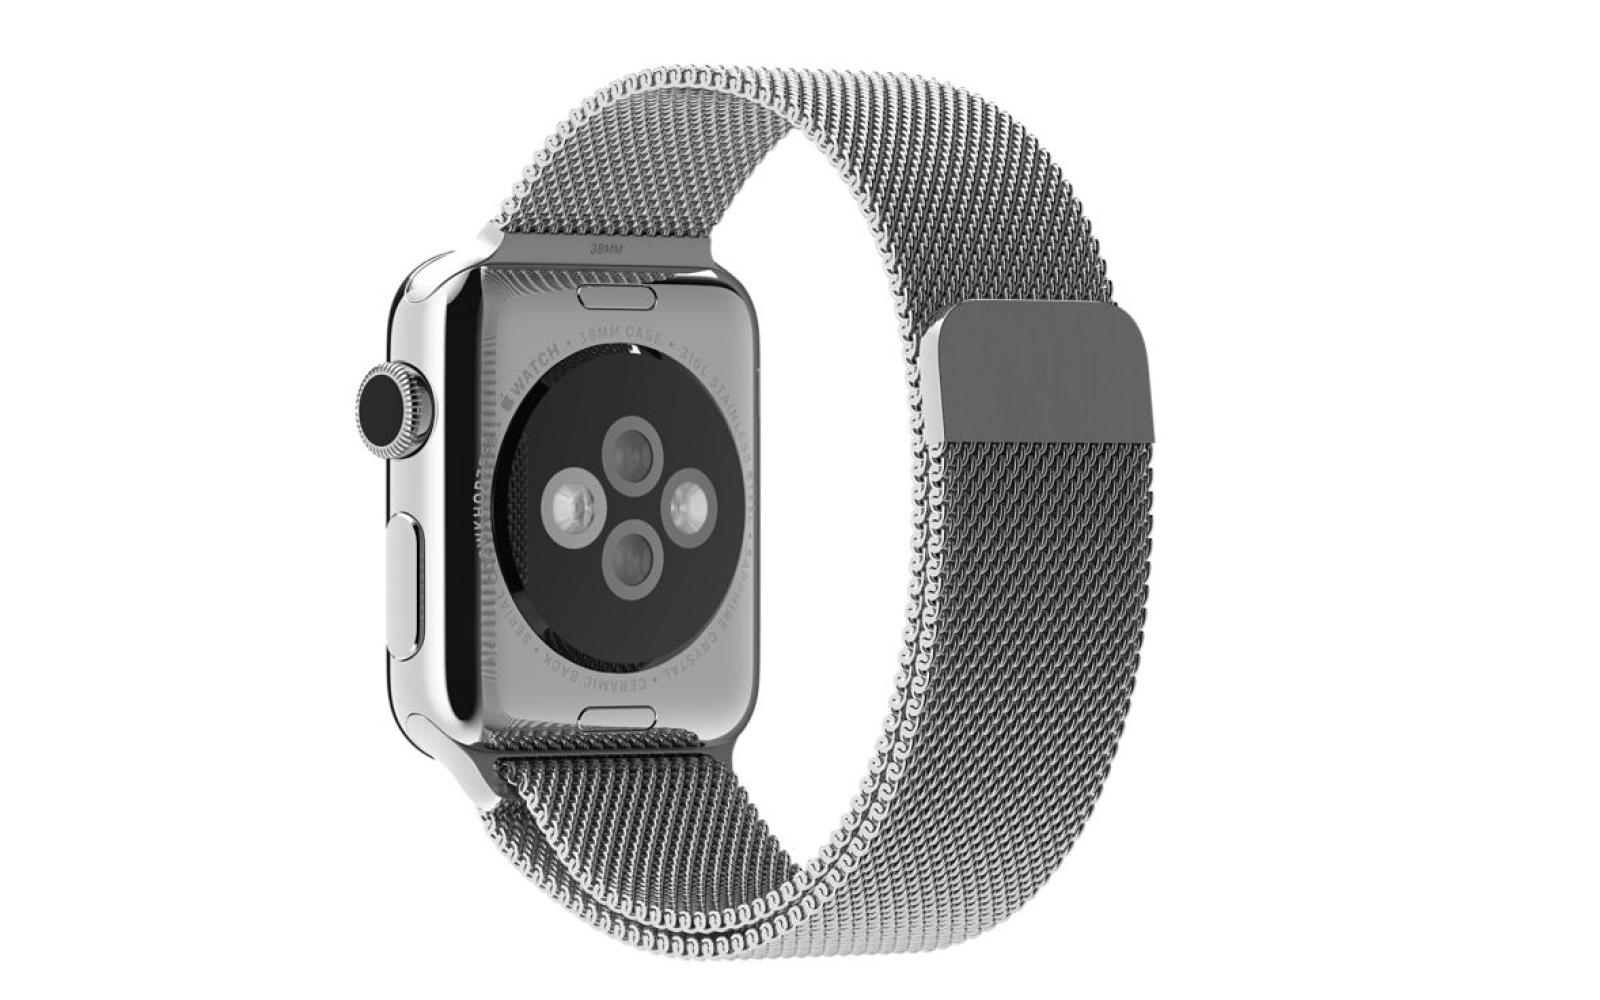 Apple Releases Watch Battery Results 42mm Model Runs Longer Baterai Iwatch 2 38mm 3h Phone 65h Music 7h Workout